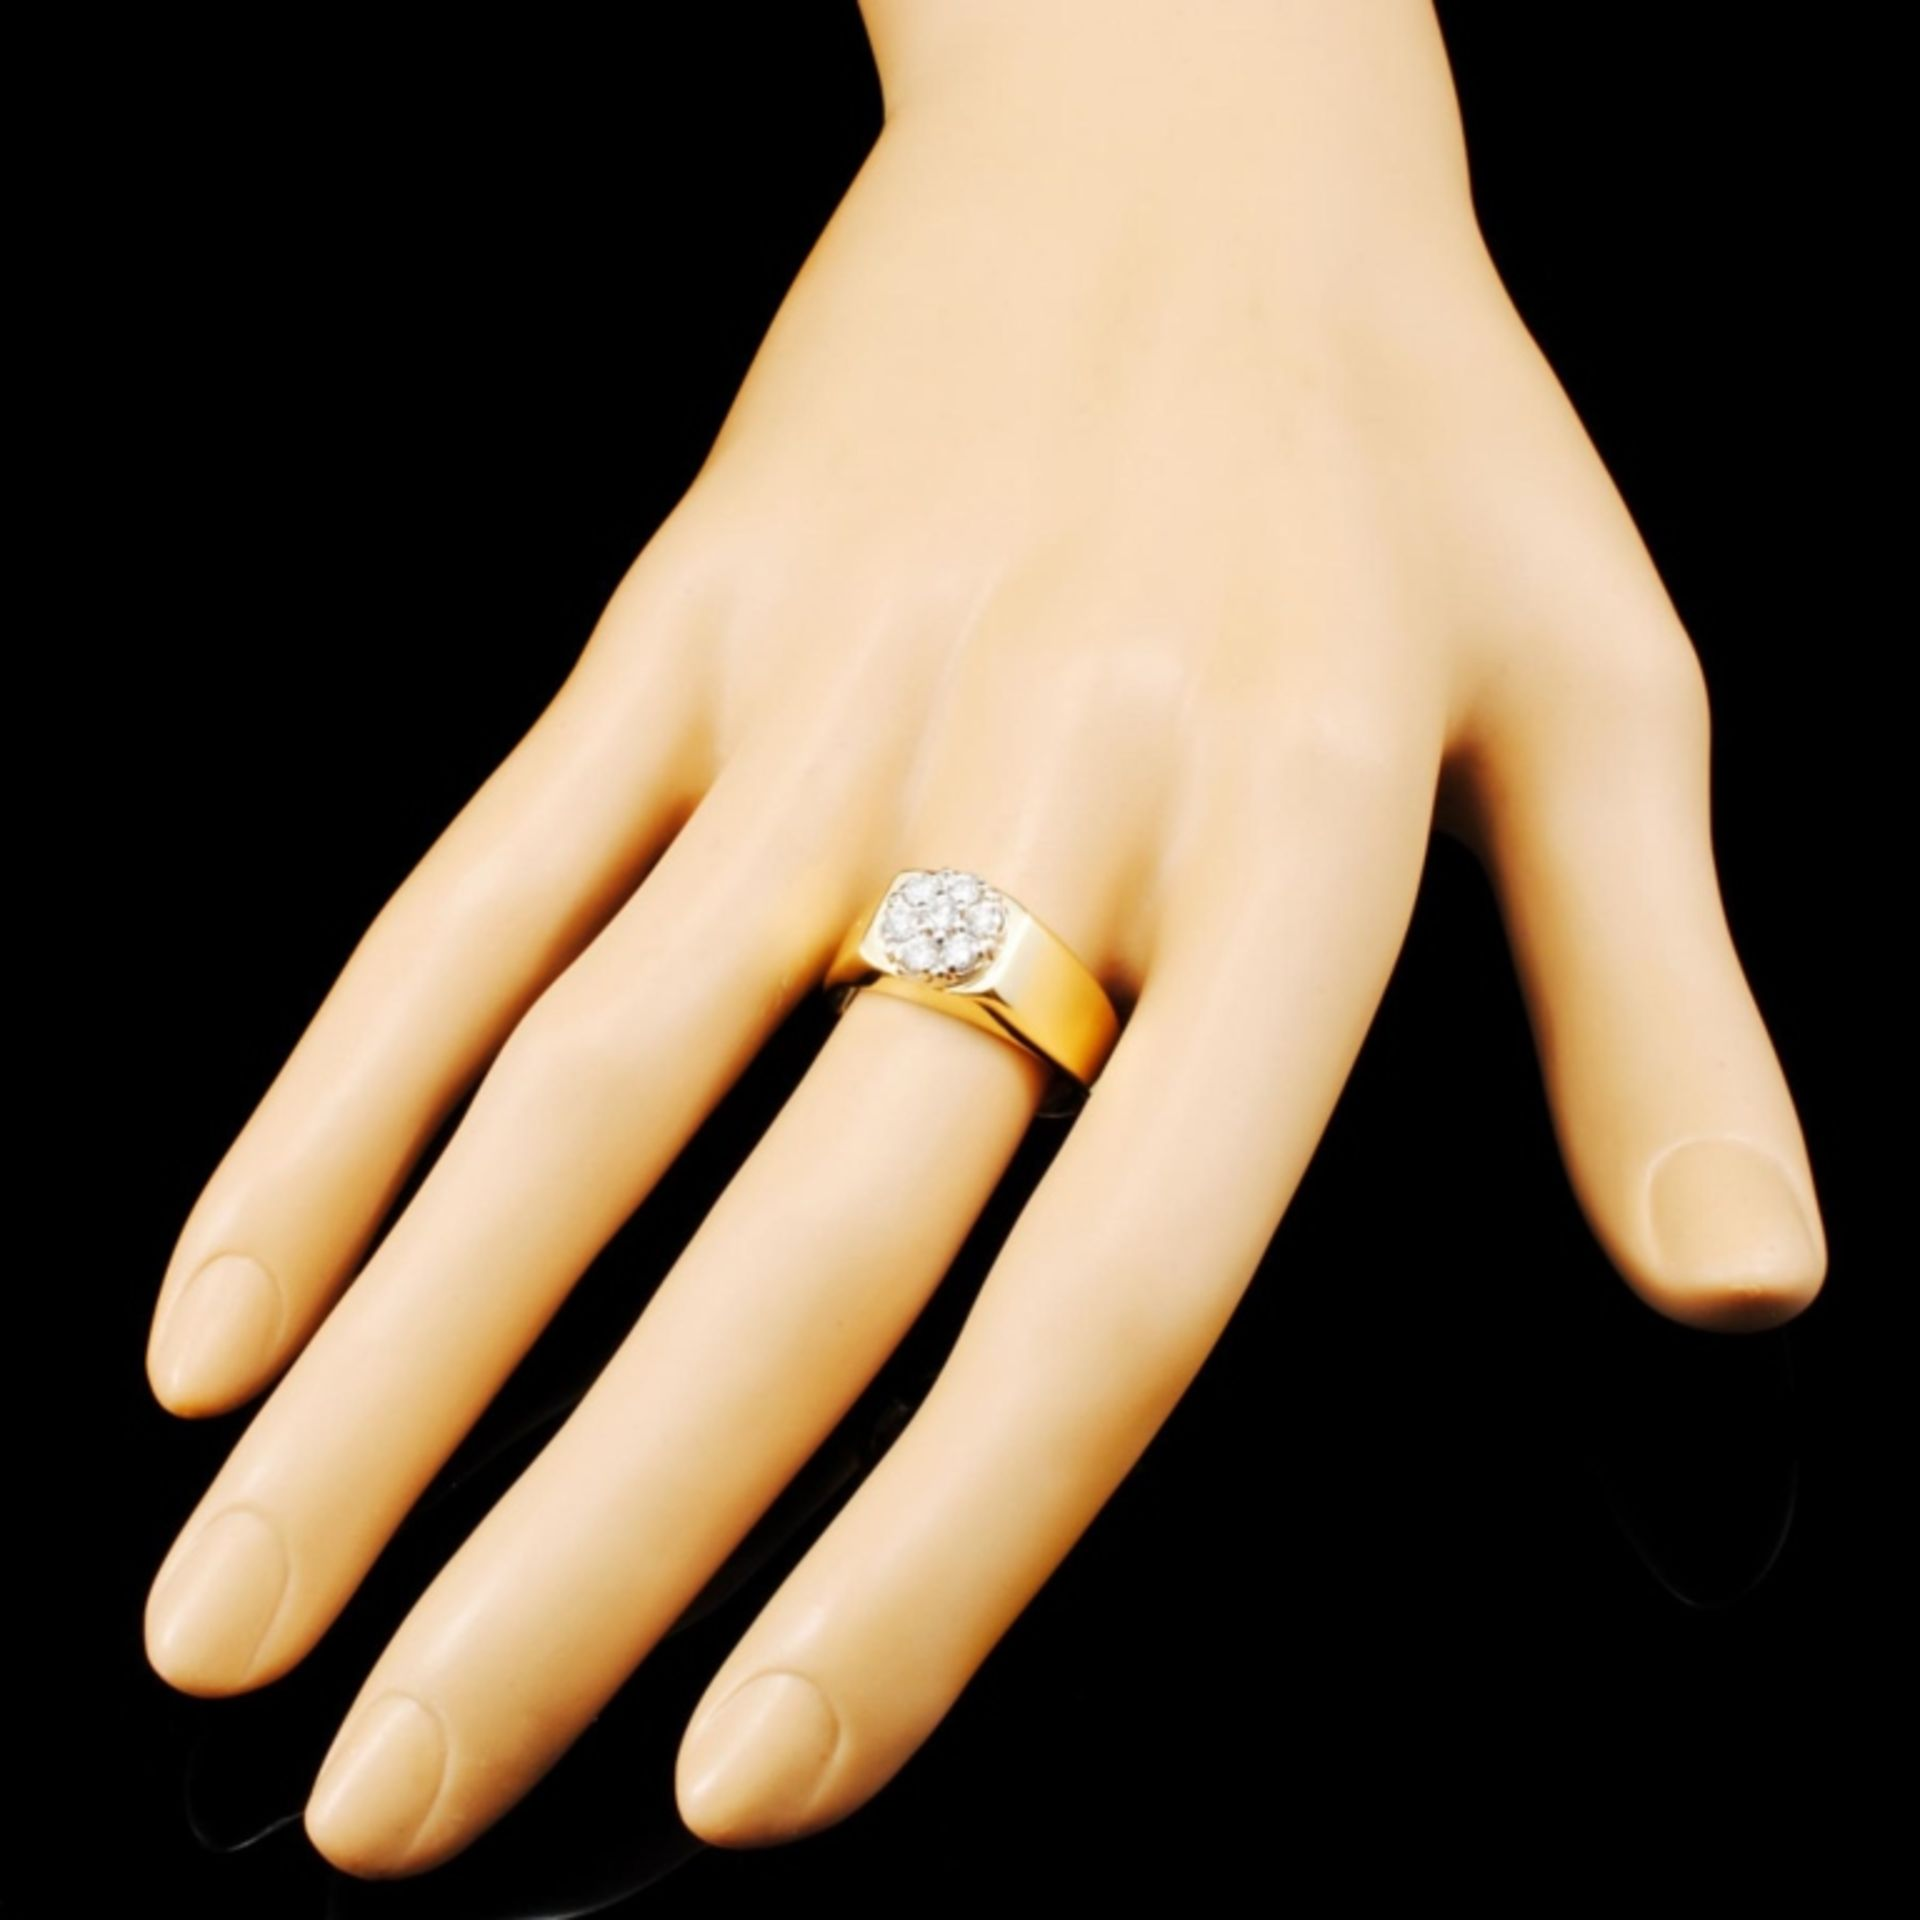 14K Gold 0.28ctw Diamond Ring - Image 3 of 5